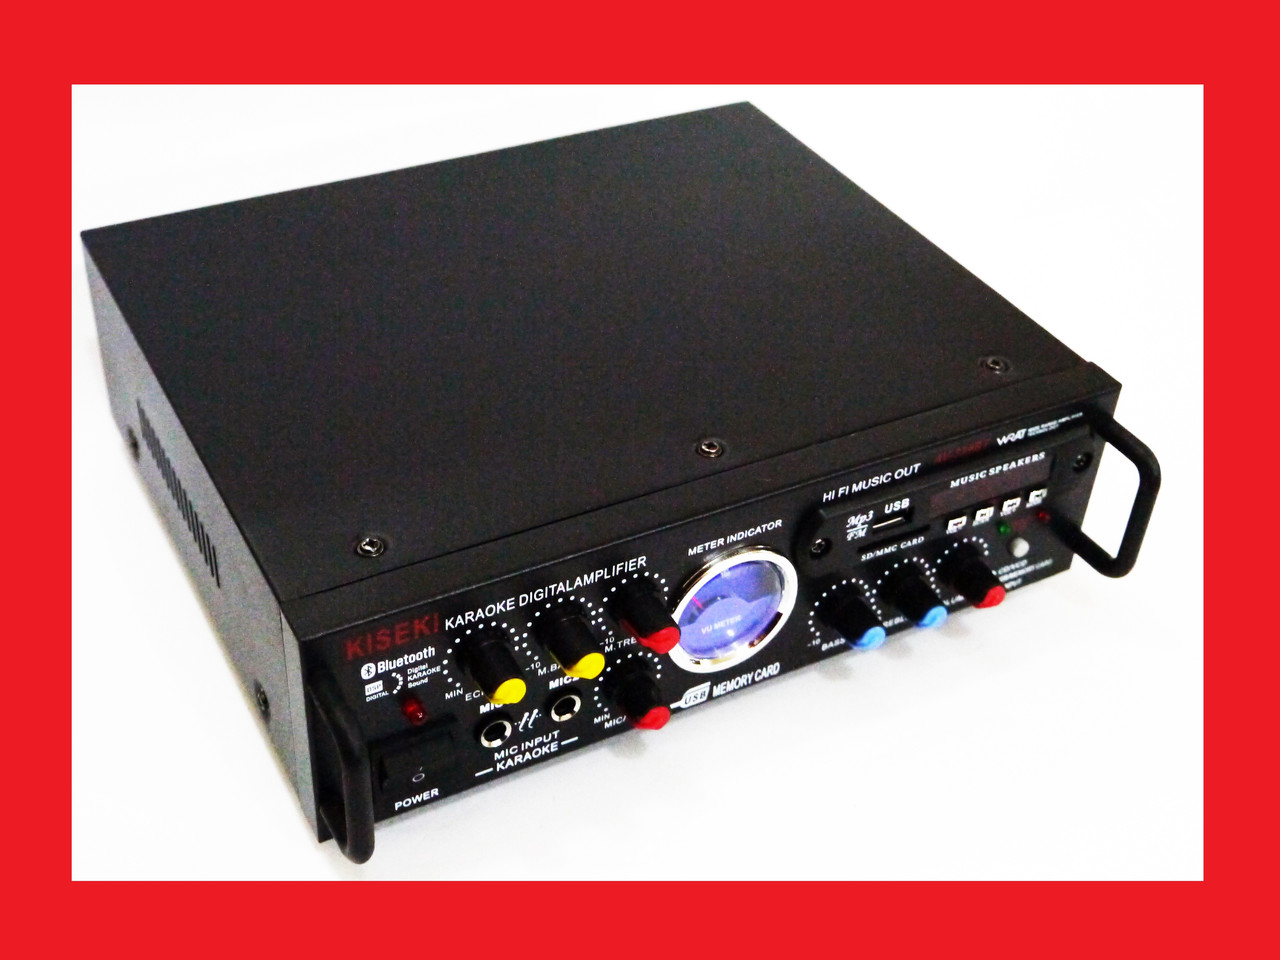 Підсилювач звуку Kiseki AV-339B + USB + Fm + Mp3 + КАРАОКЕ + Bluetooth